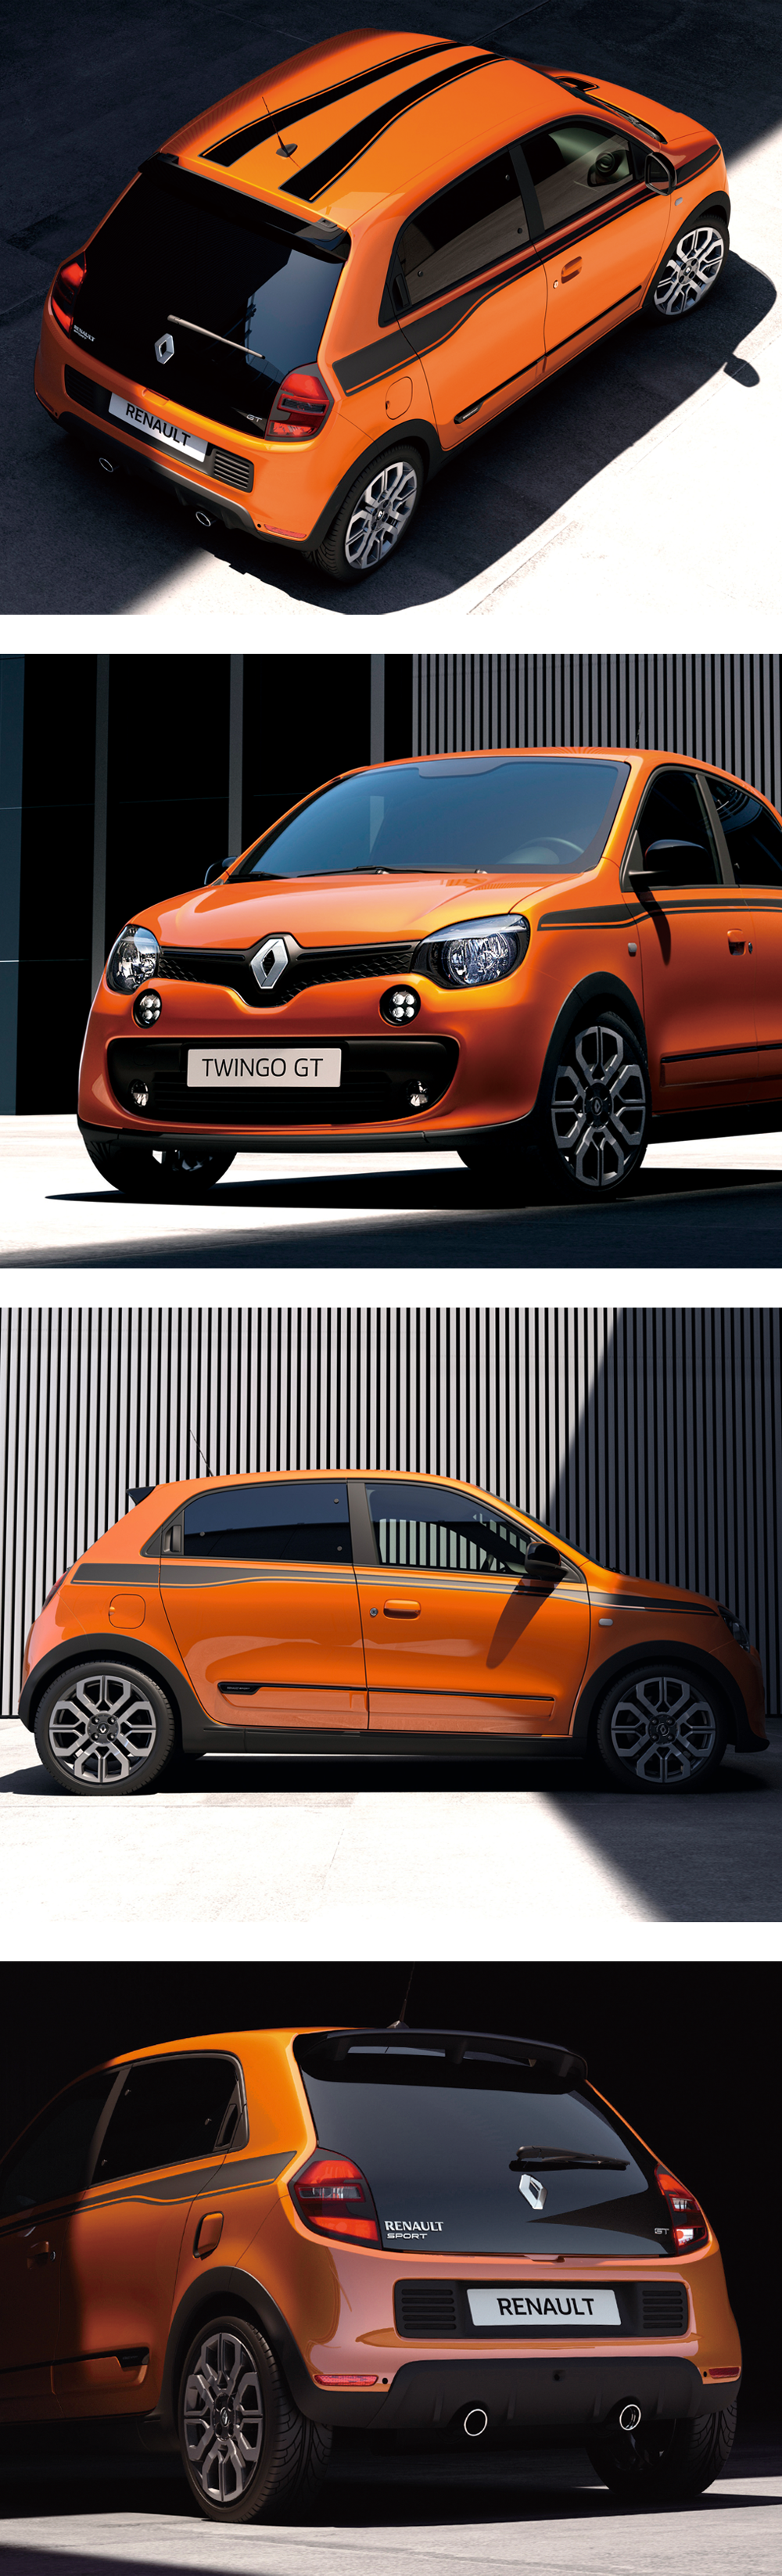 《》Renault Twingo/ルノー トゥインゴ Part19《》 [無断転載禁止]©2ch.netYouTube動画>4本 ->画像>41枚